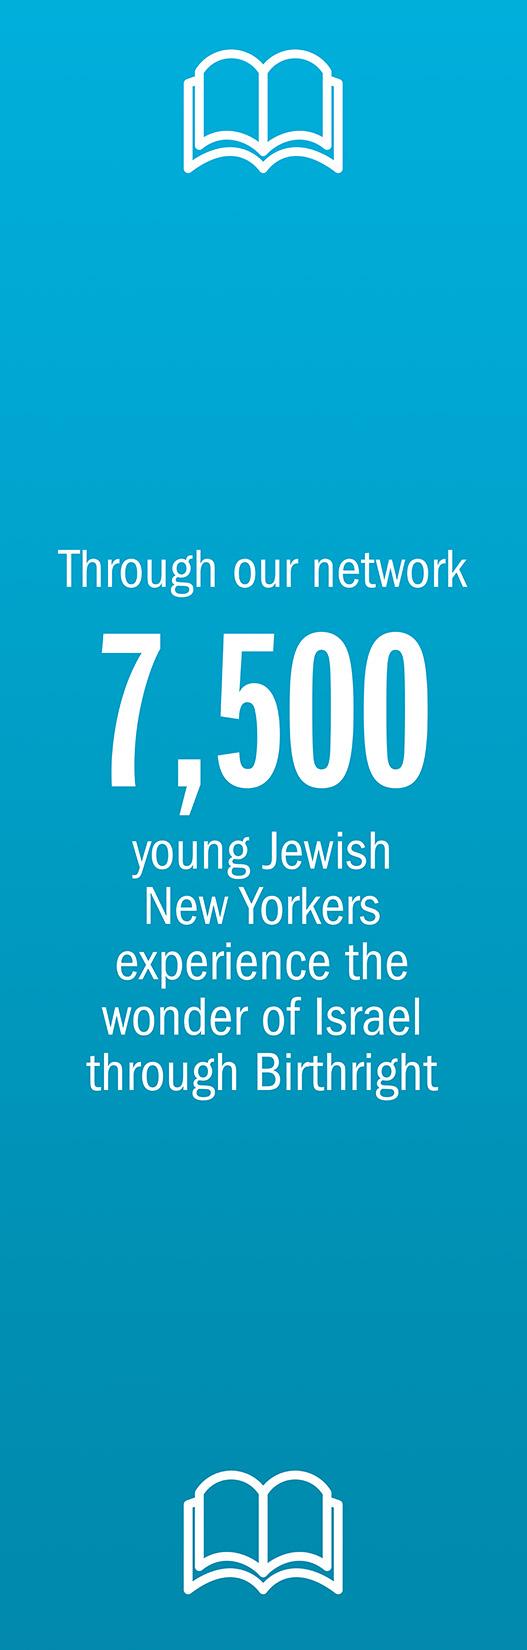 UJA Jewish Education Banner rev06 Side B.jpg